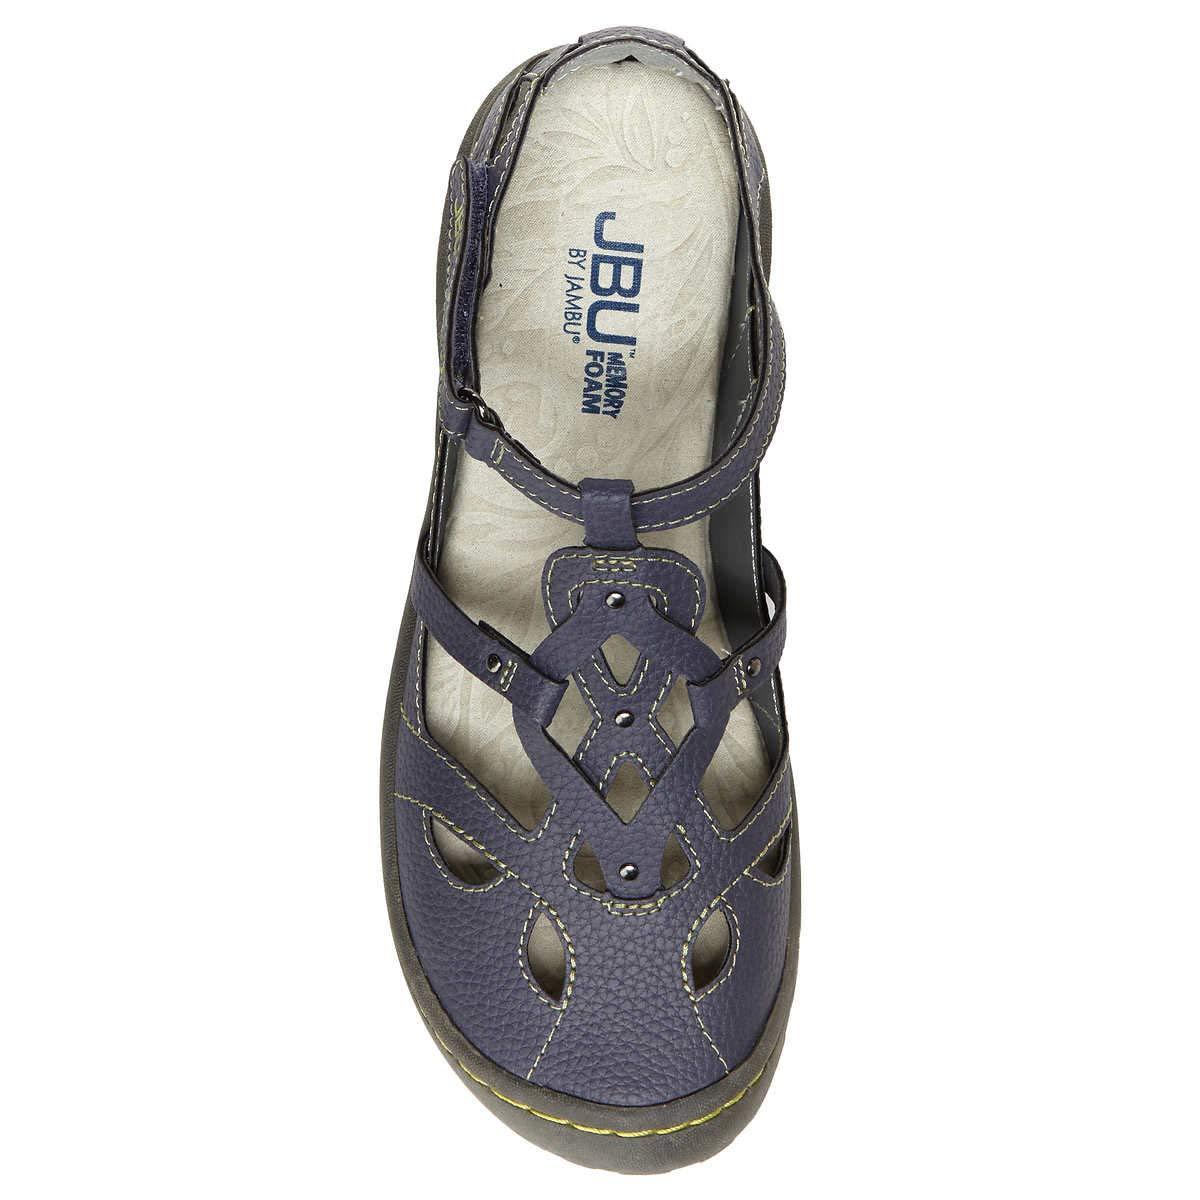 079f3272d87b9 JBU by Jambu Ladies' Sydney Sandal/Flat Sandals for Women